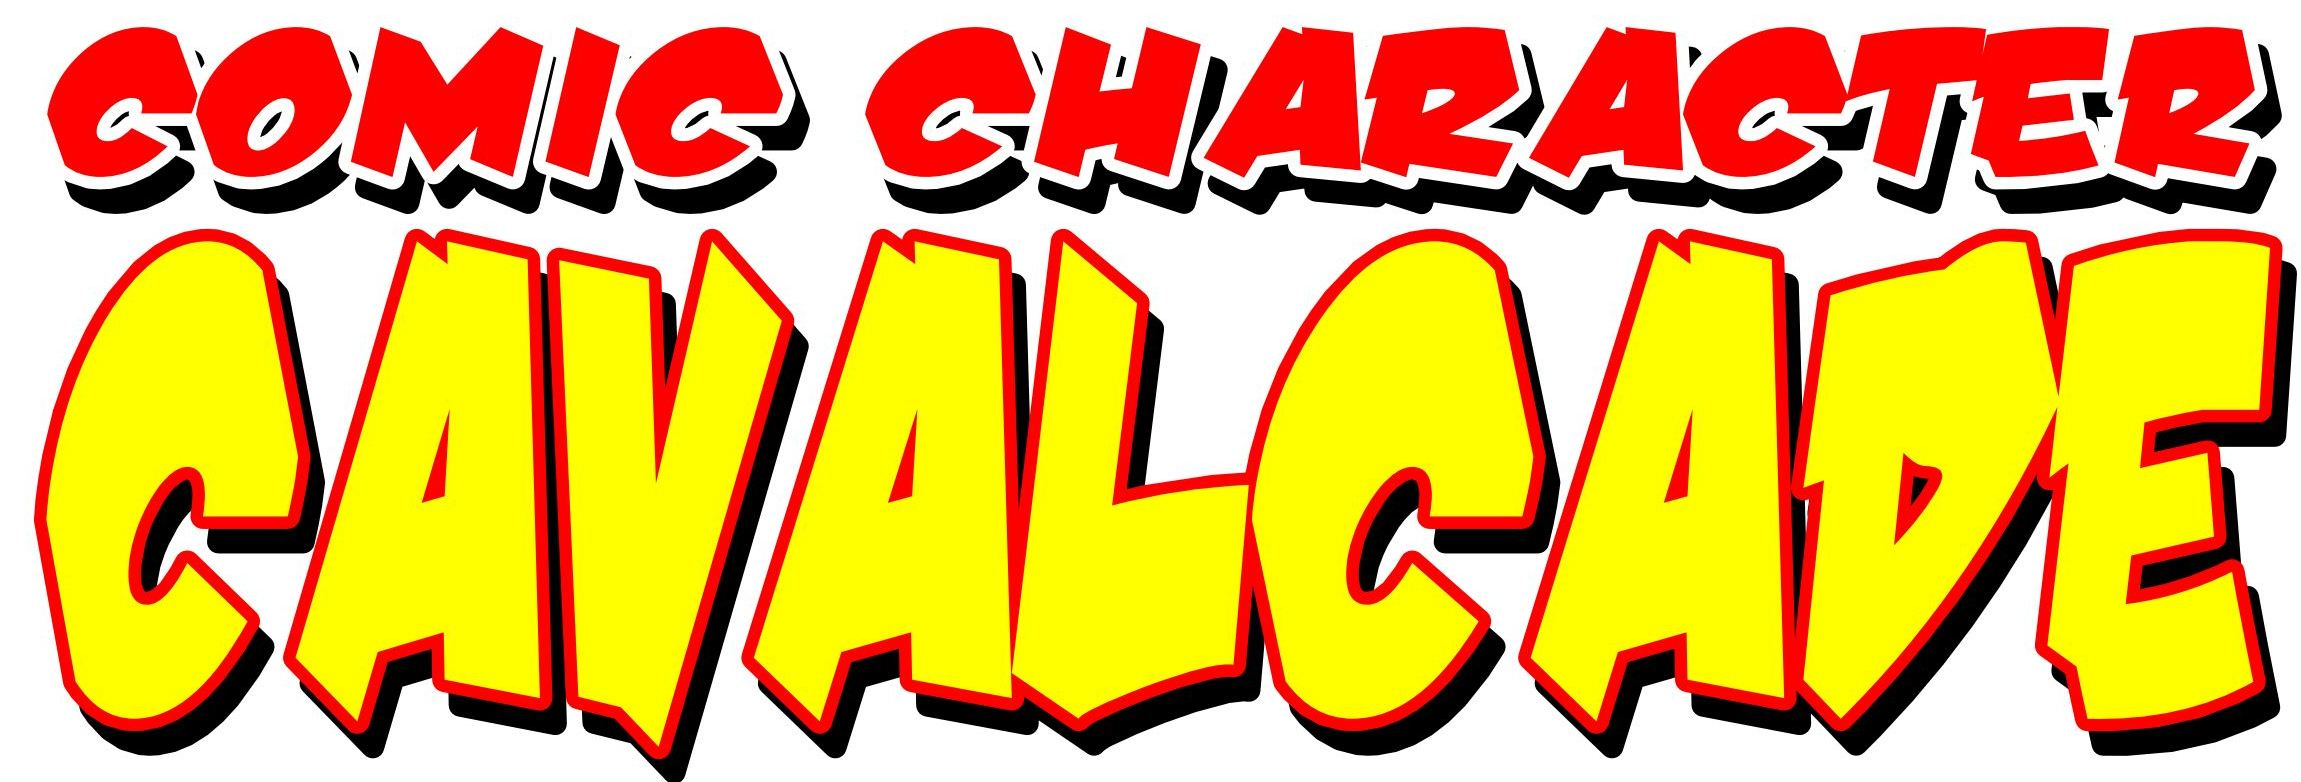 Comic Character Cavalcade